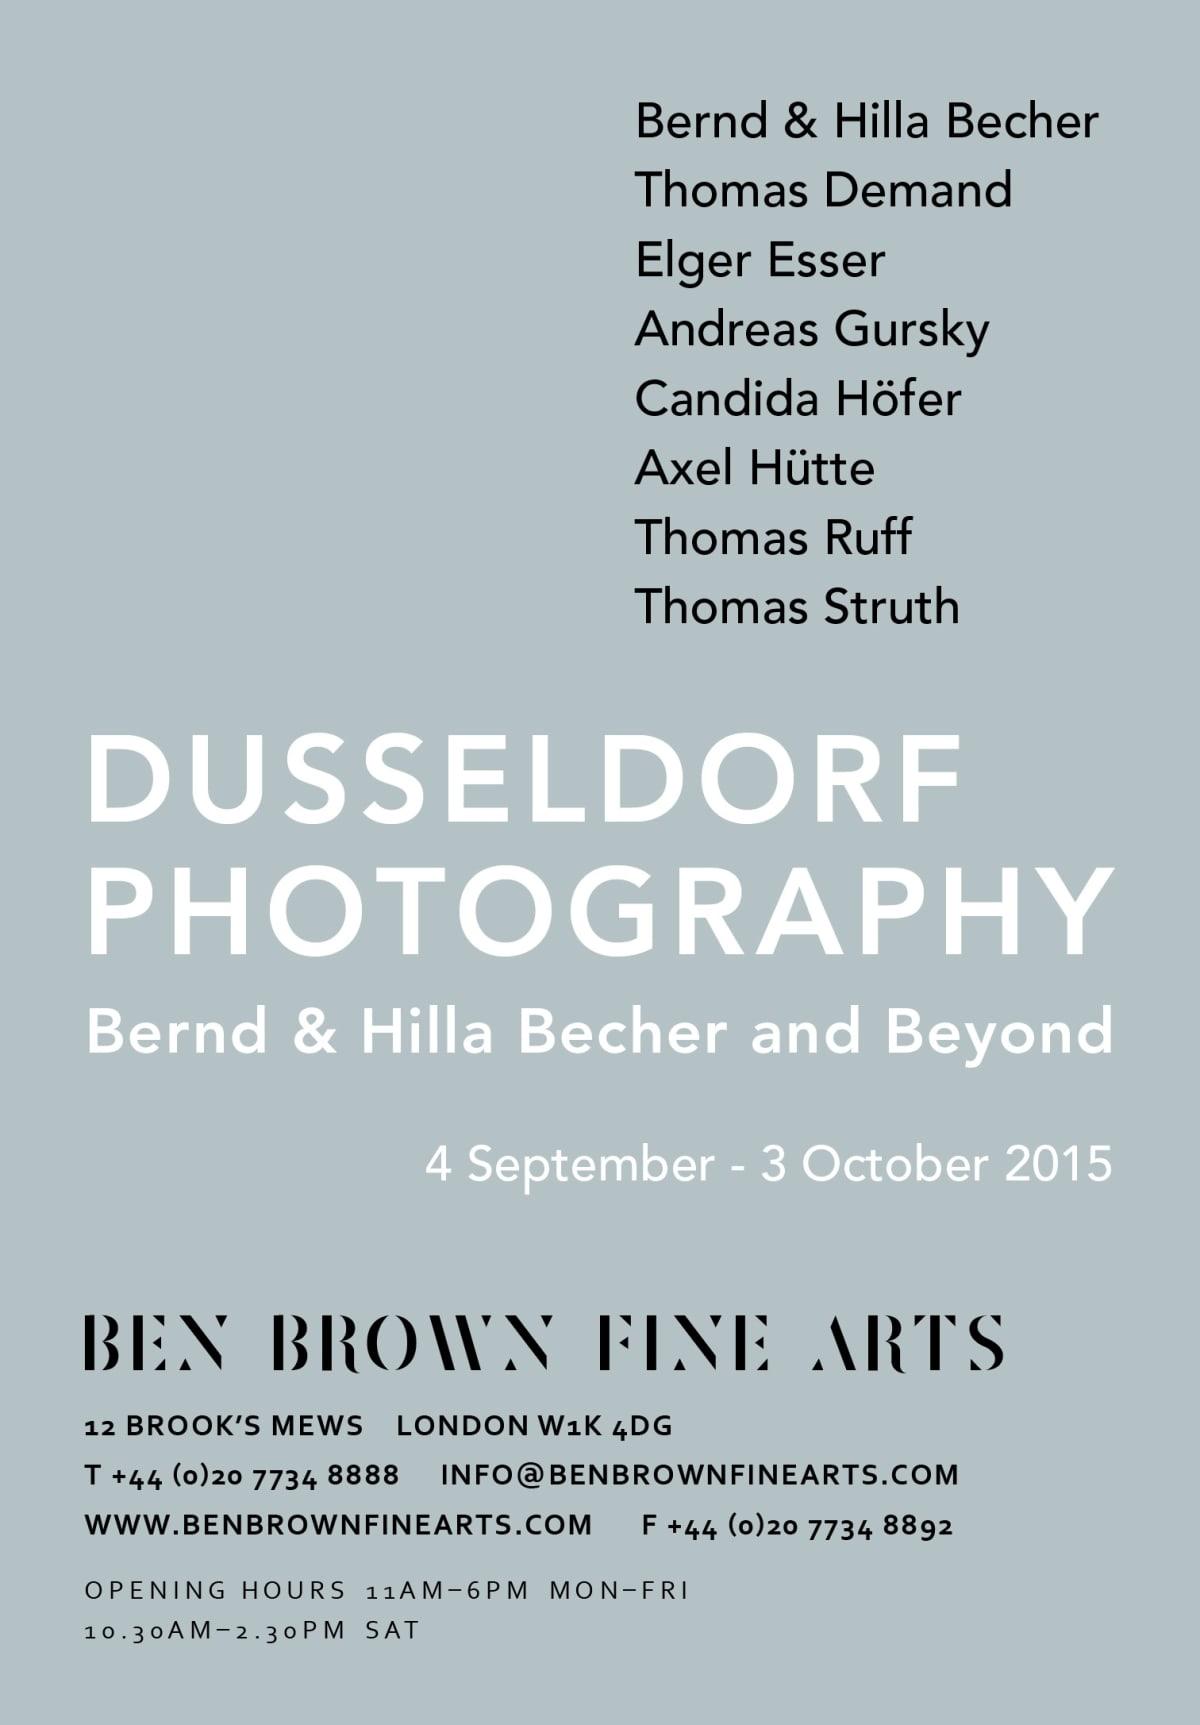 Dusseldorf Photography